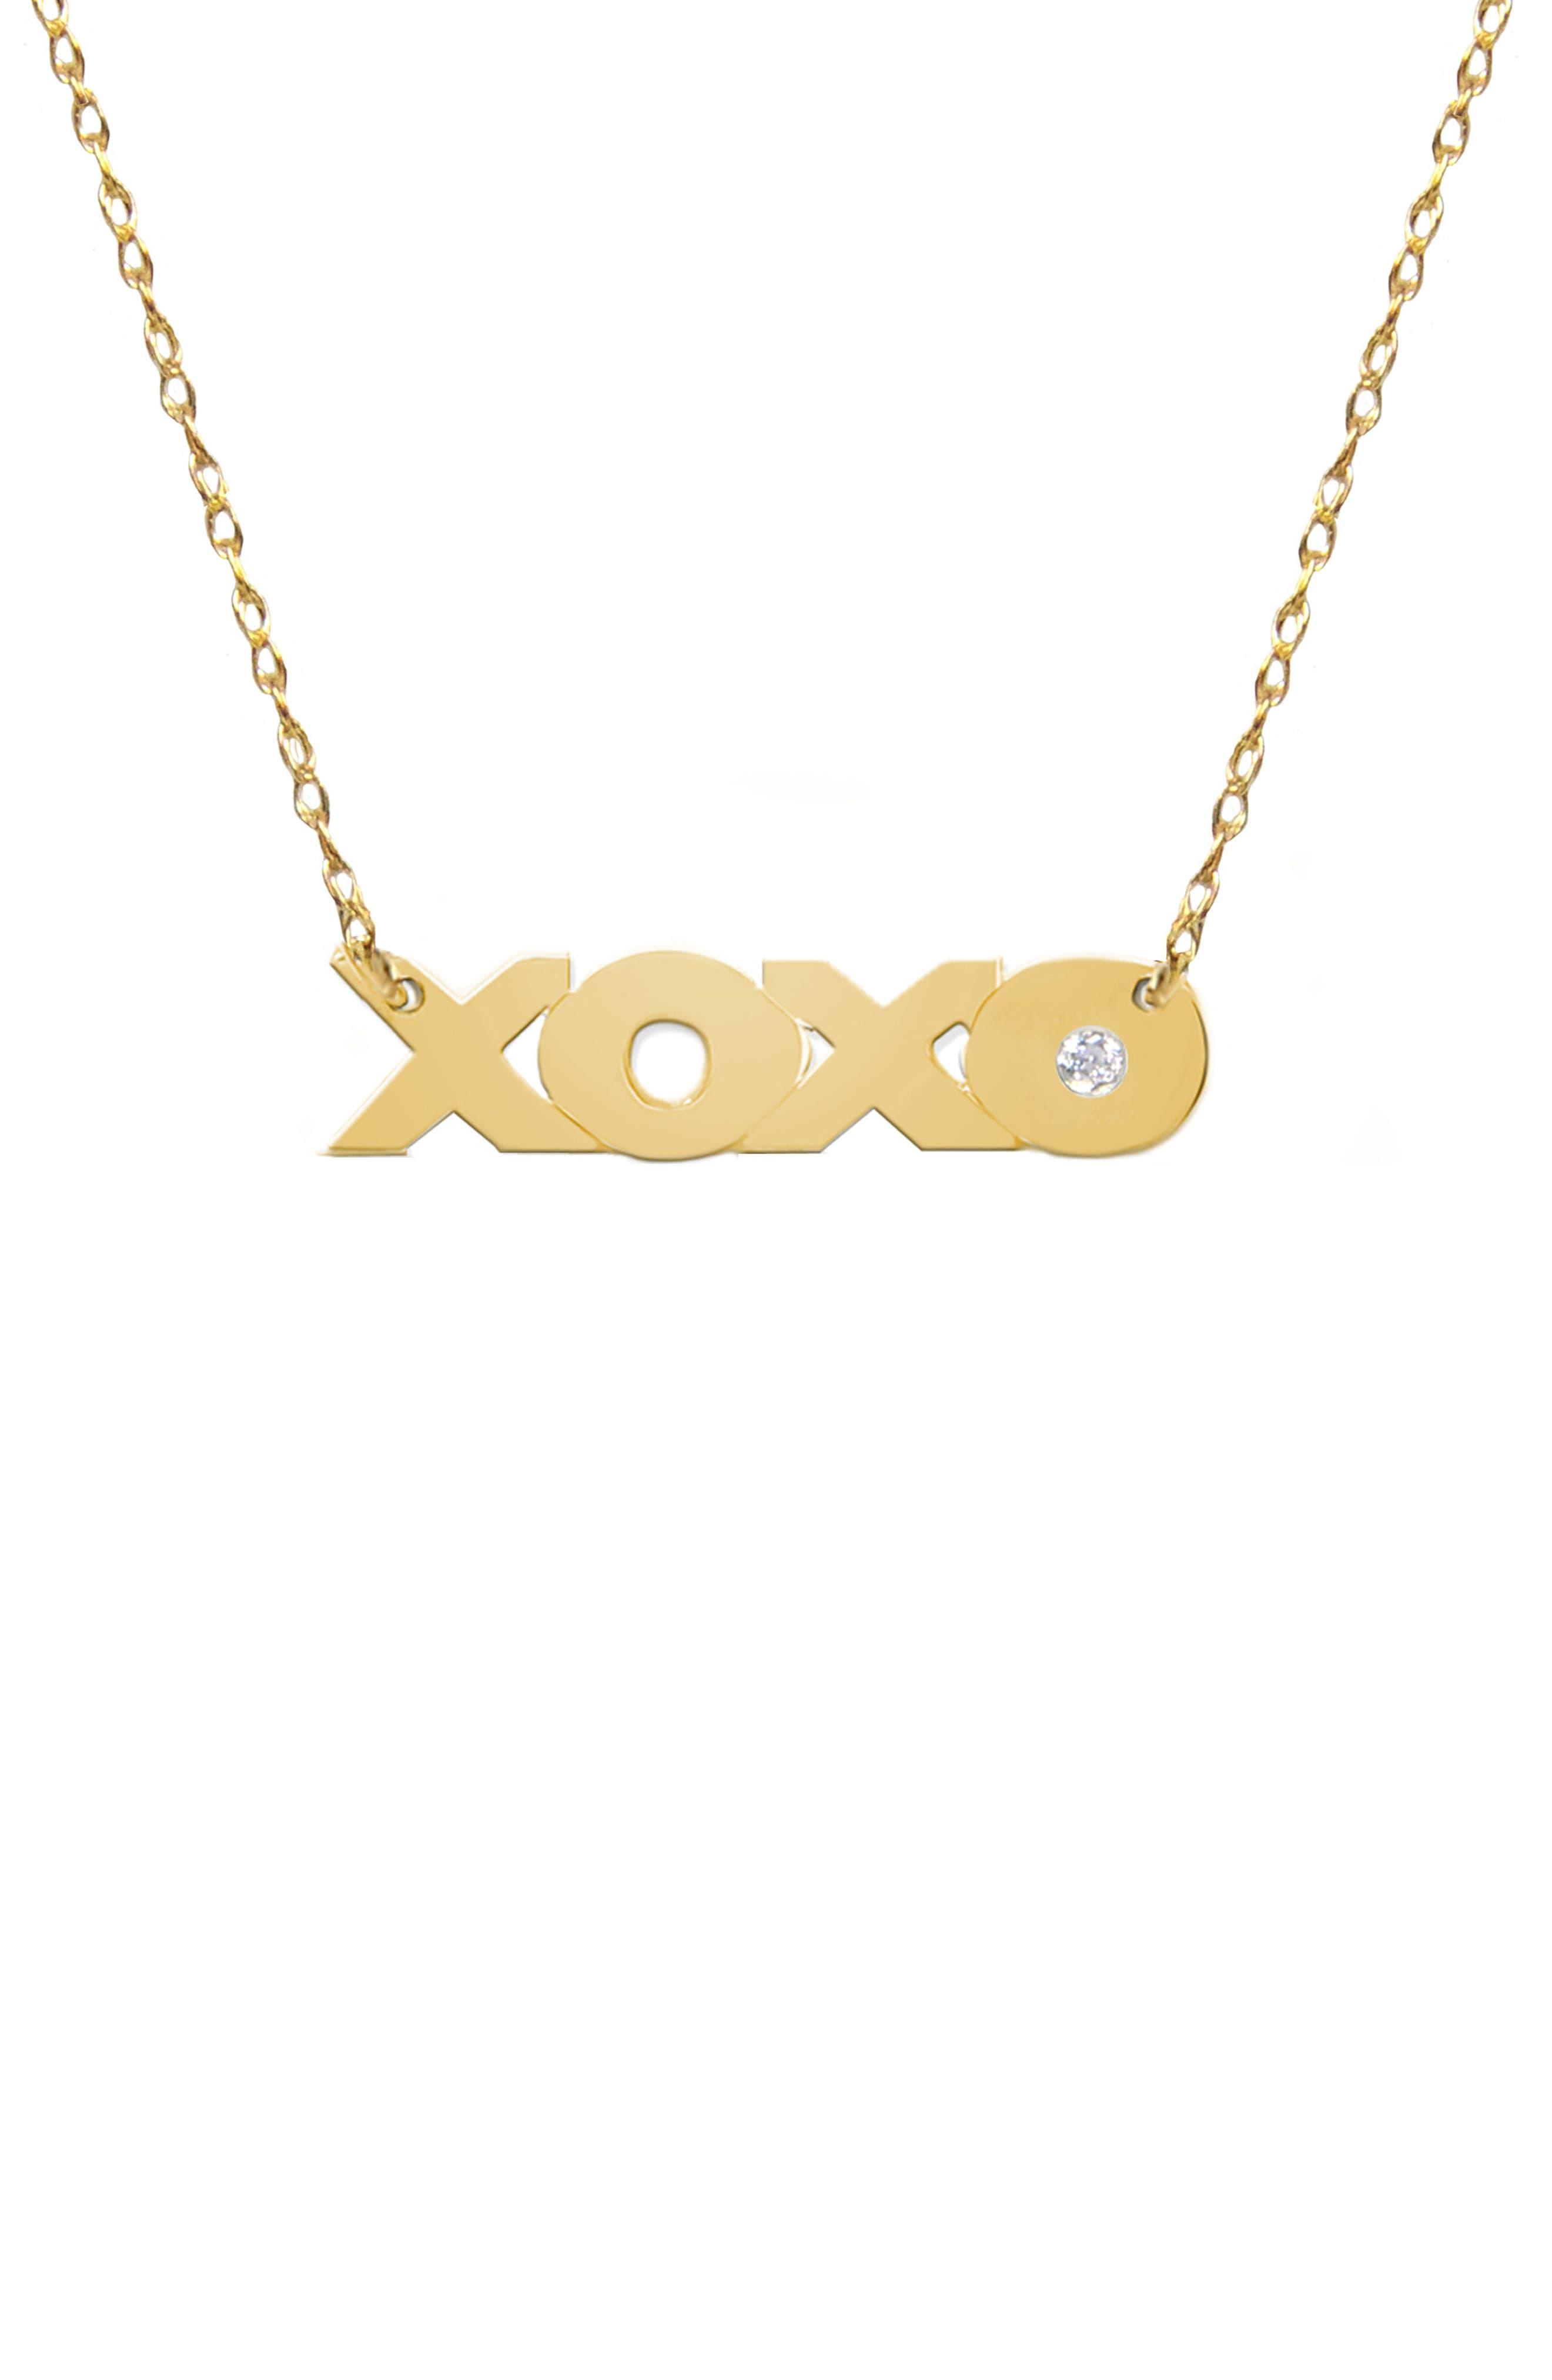 Jane Basch Designs XOXO Diamond Pendant Necklace (Nordstrom Exclusive)